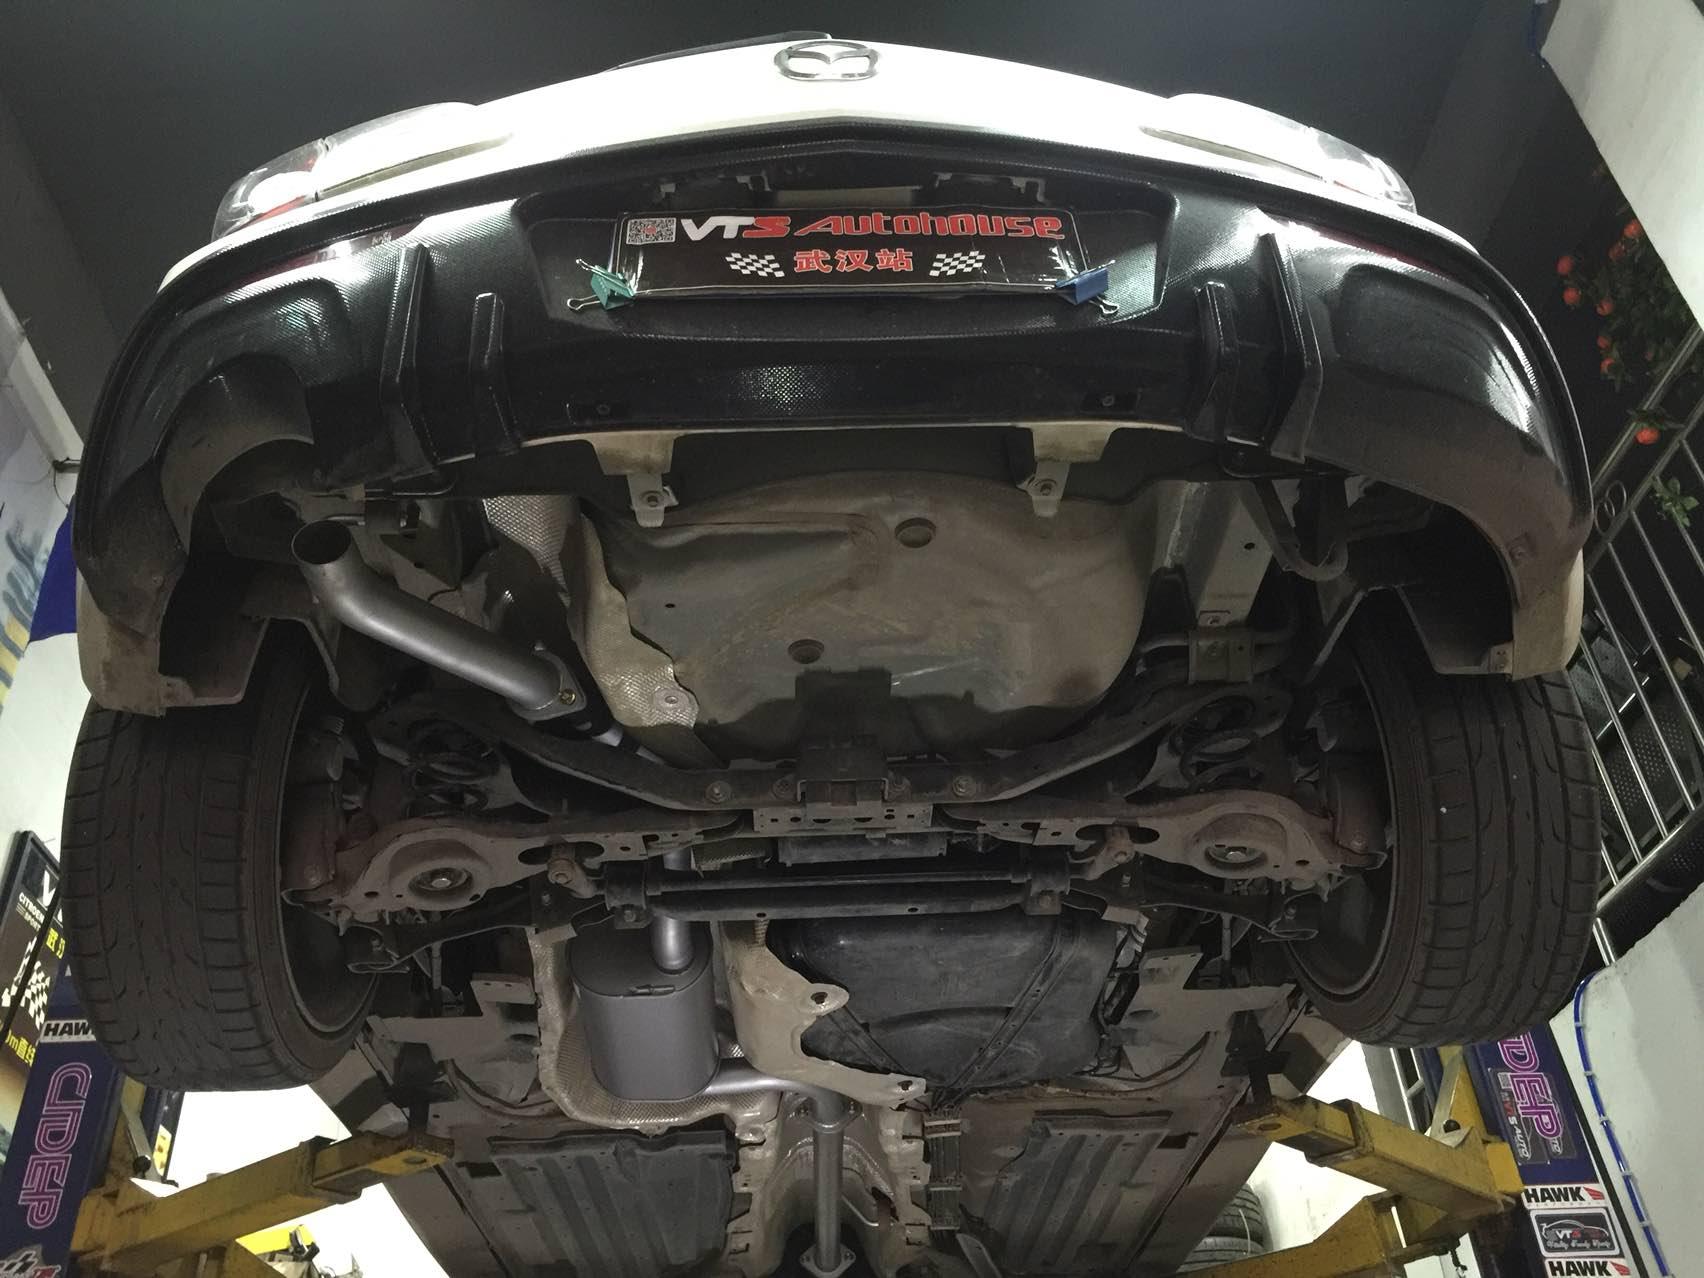 Mazda3星骋改装Sebring排气中尾段,同样来自奥地利的老牌排气,品质无忧,声浪美美!